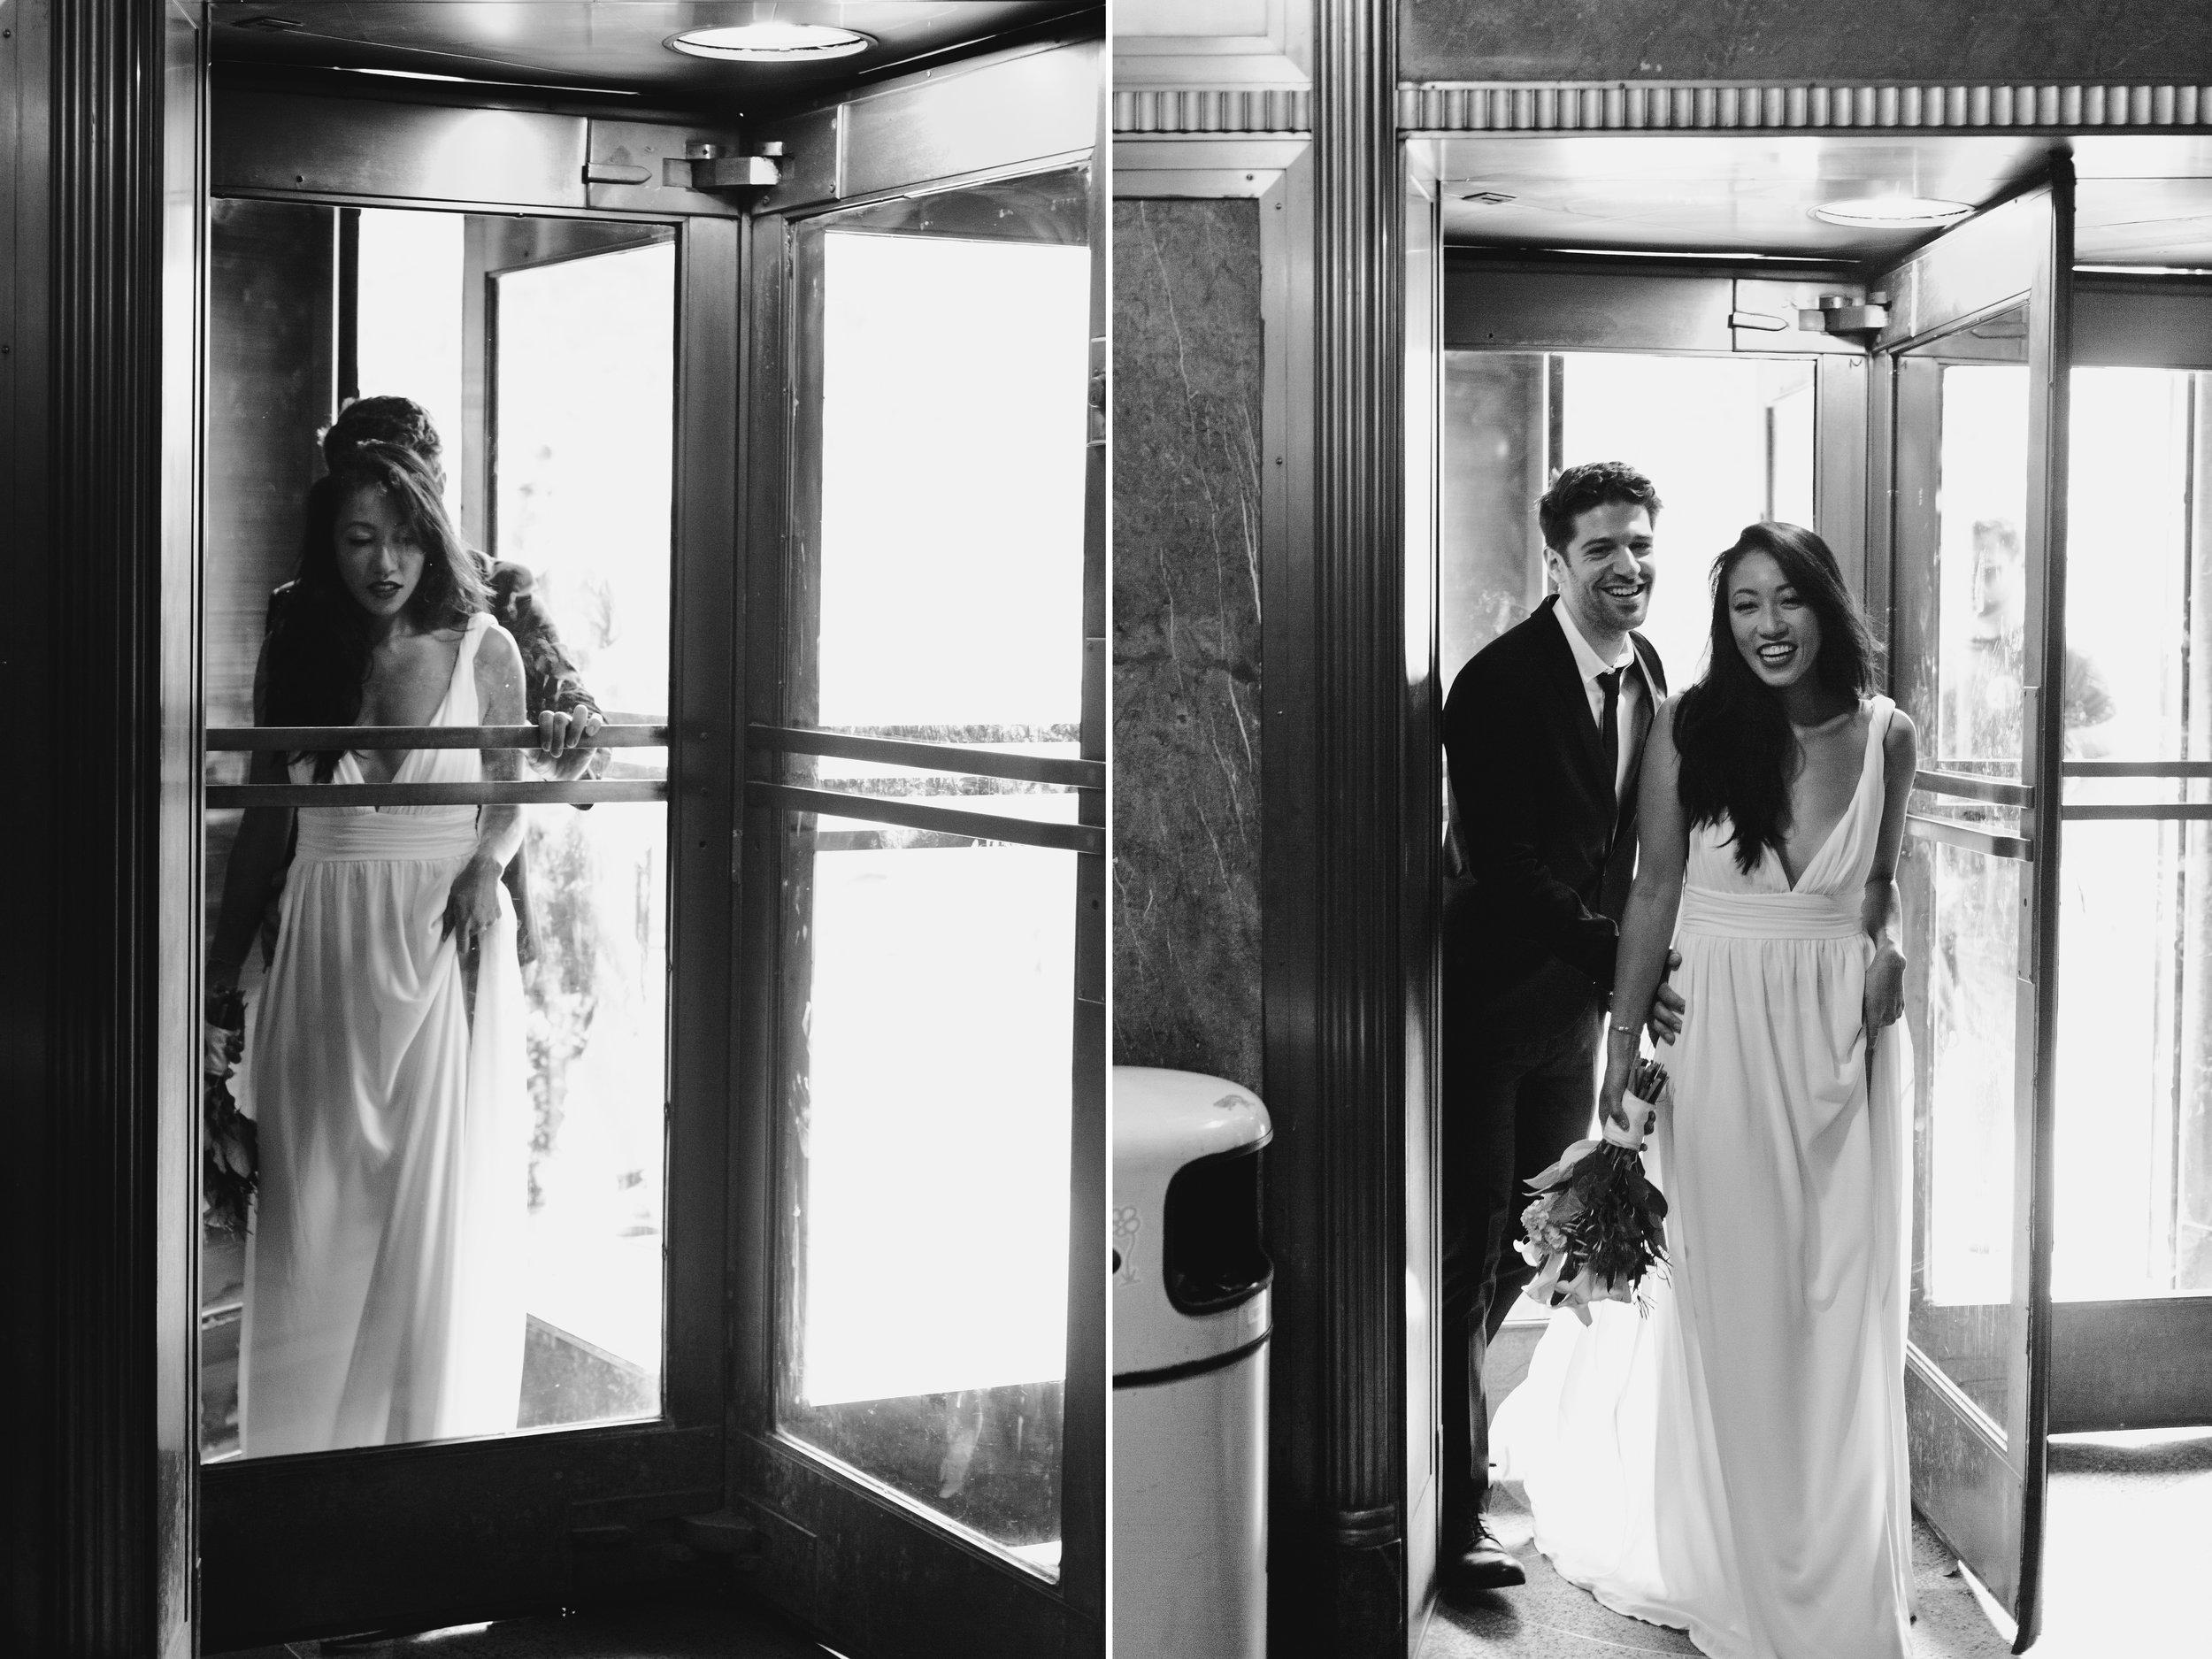 New York wedding photographer, New York City wedding photographer, City Hall wedding photographer, NYC wedding photographer, Manhattan wedding photographer, Manhattan wedding, New York City Hall